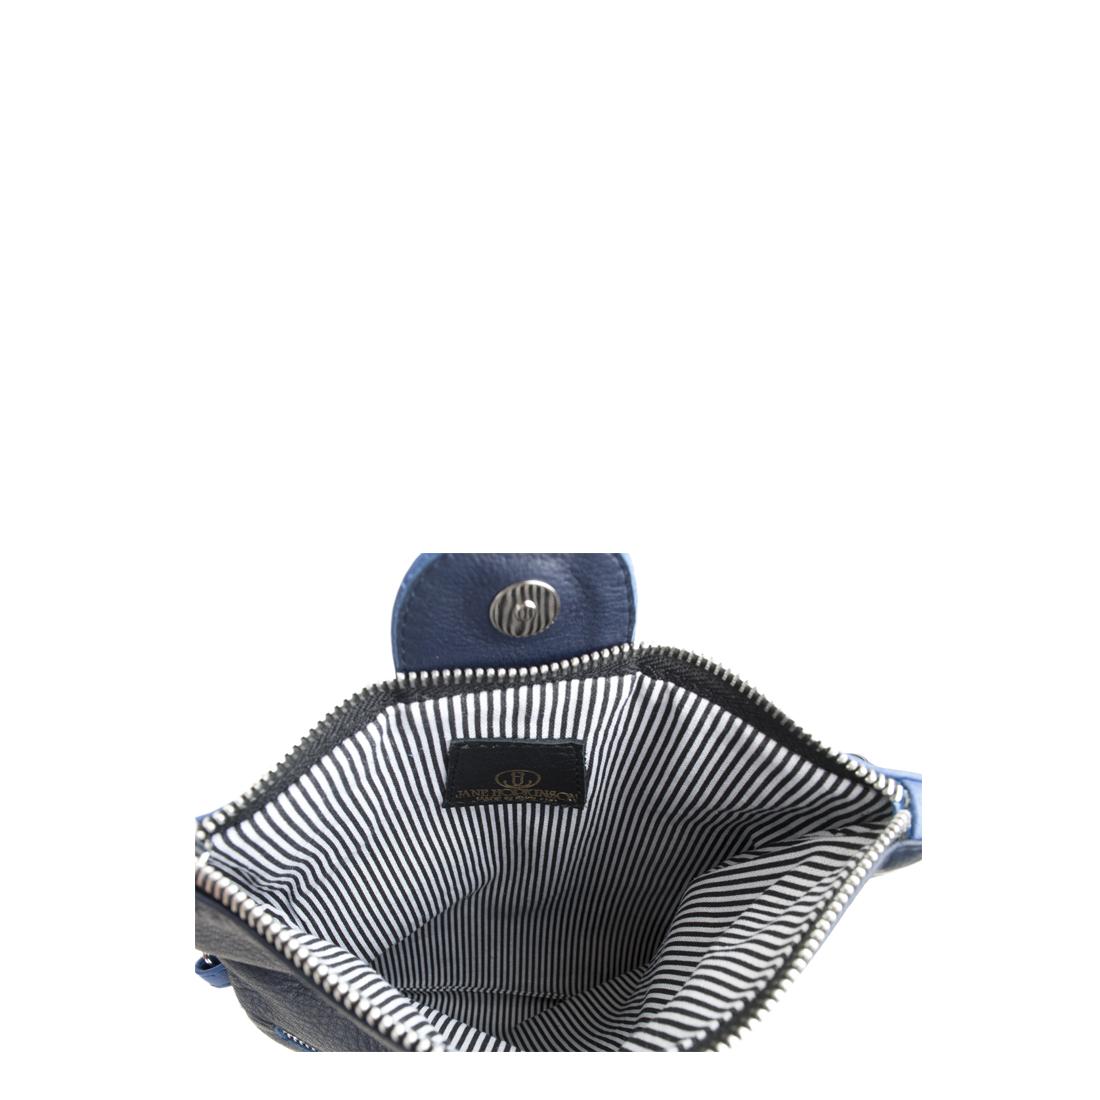 Lilly Navy Blue Across Body Bag